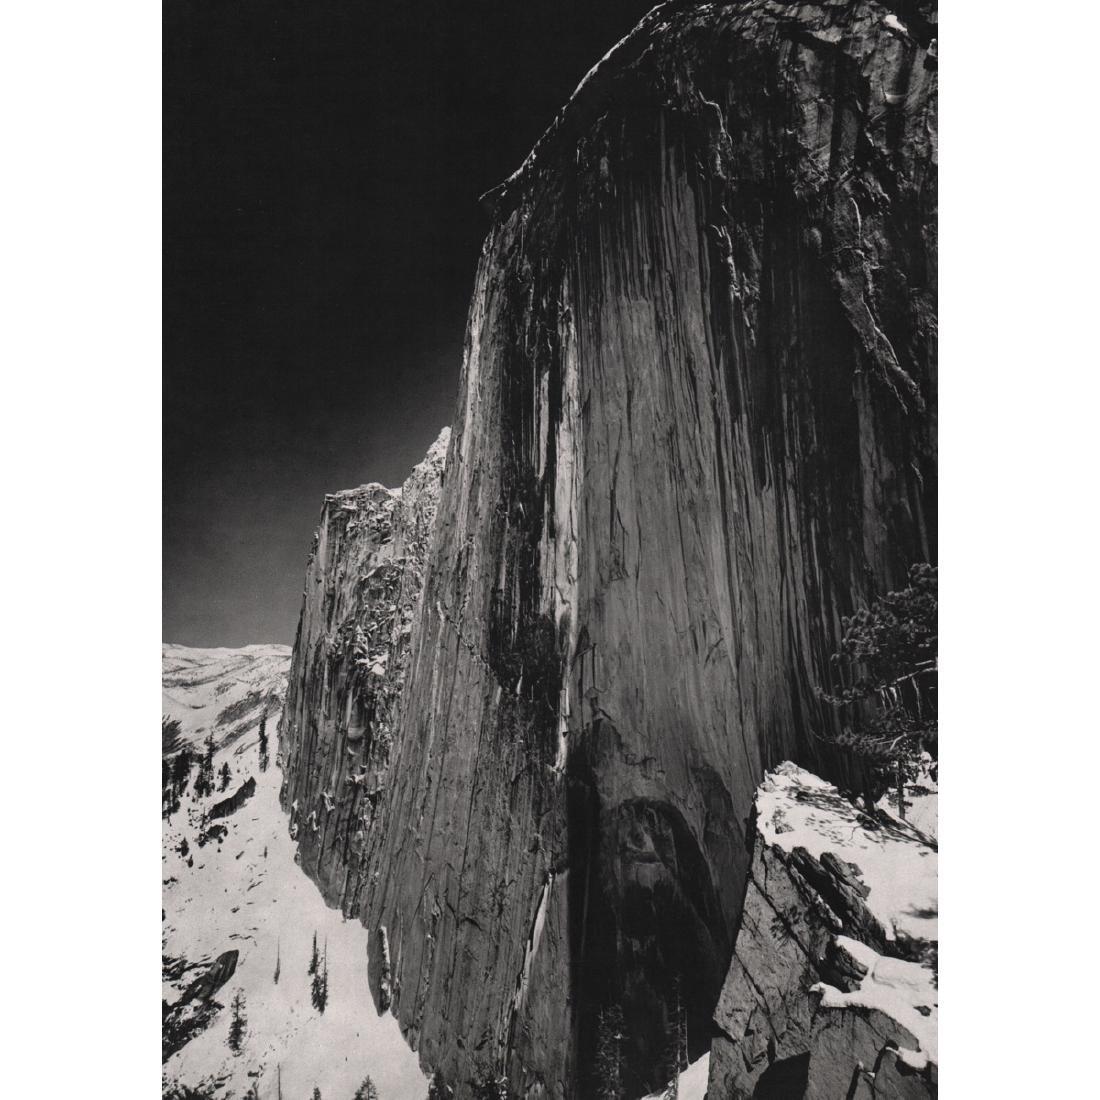 ANSEL ADAMS - Monolith - The Face of Half Dome, 1927